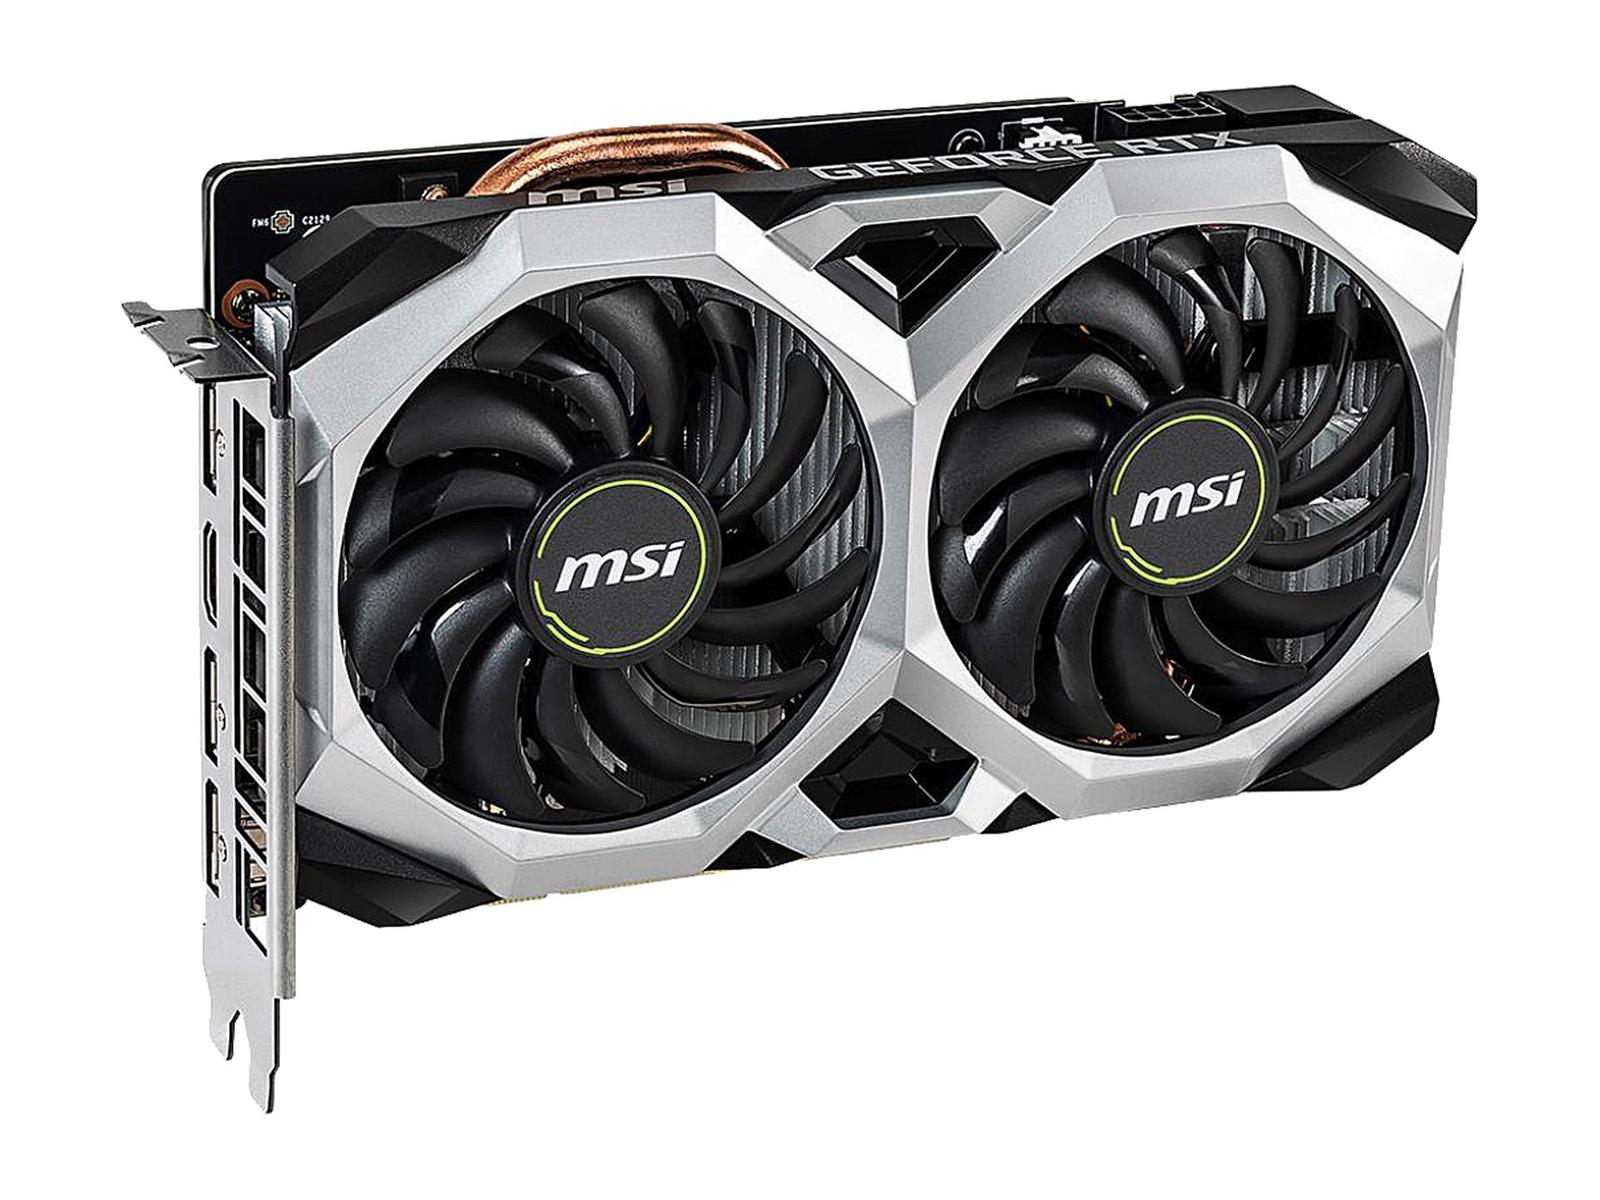 MSI GeForce RTX 2060 6 GB VENTUS XS OC Video Card